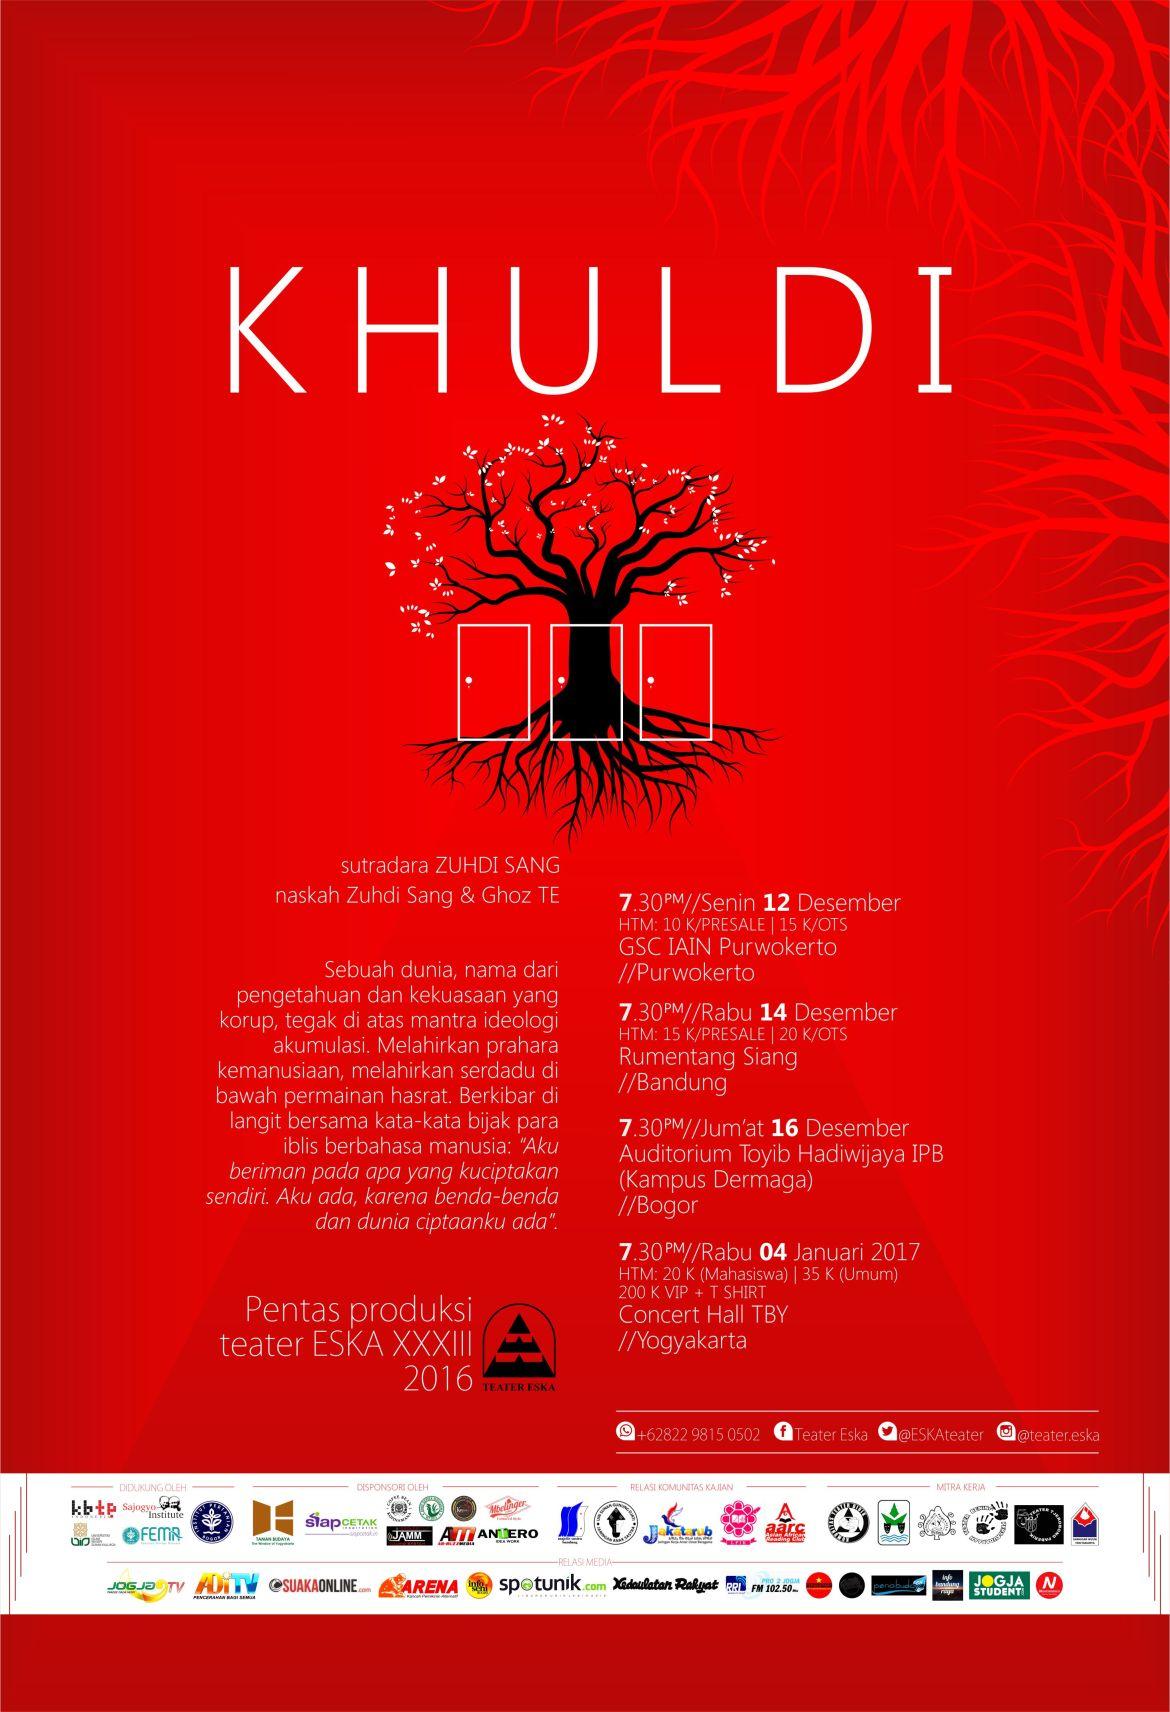 poster-pentas-produksi-teater-eska-xxxiii-khuldi-2016_bek